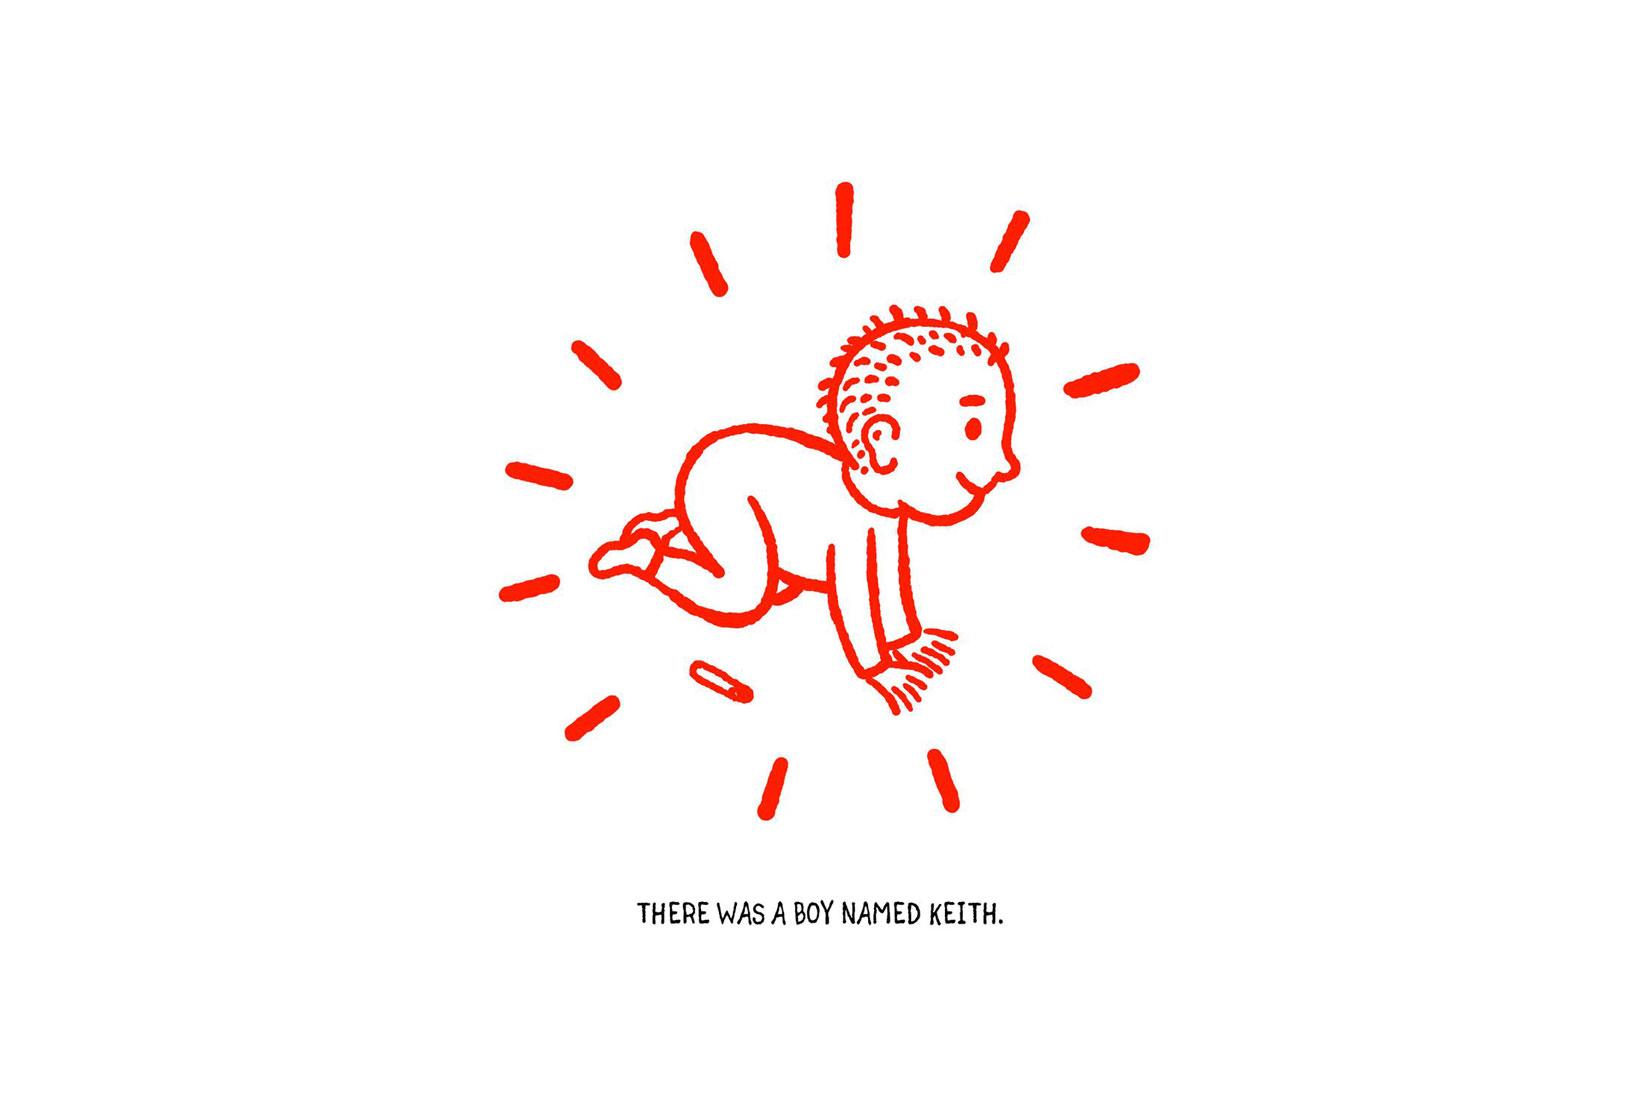 Keith Haring hypebeastkids